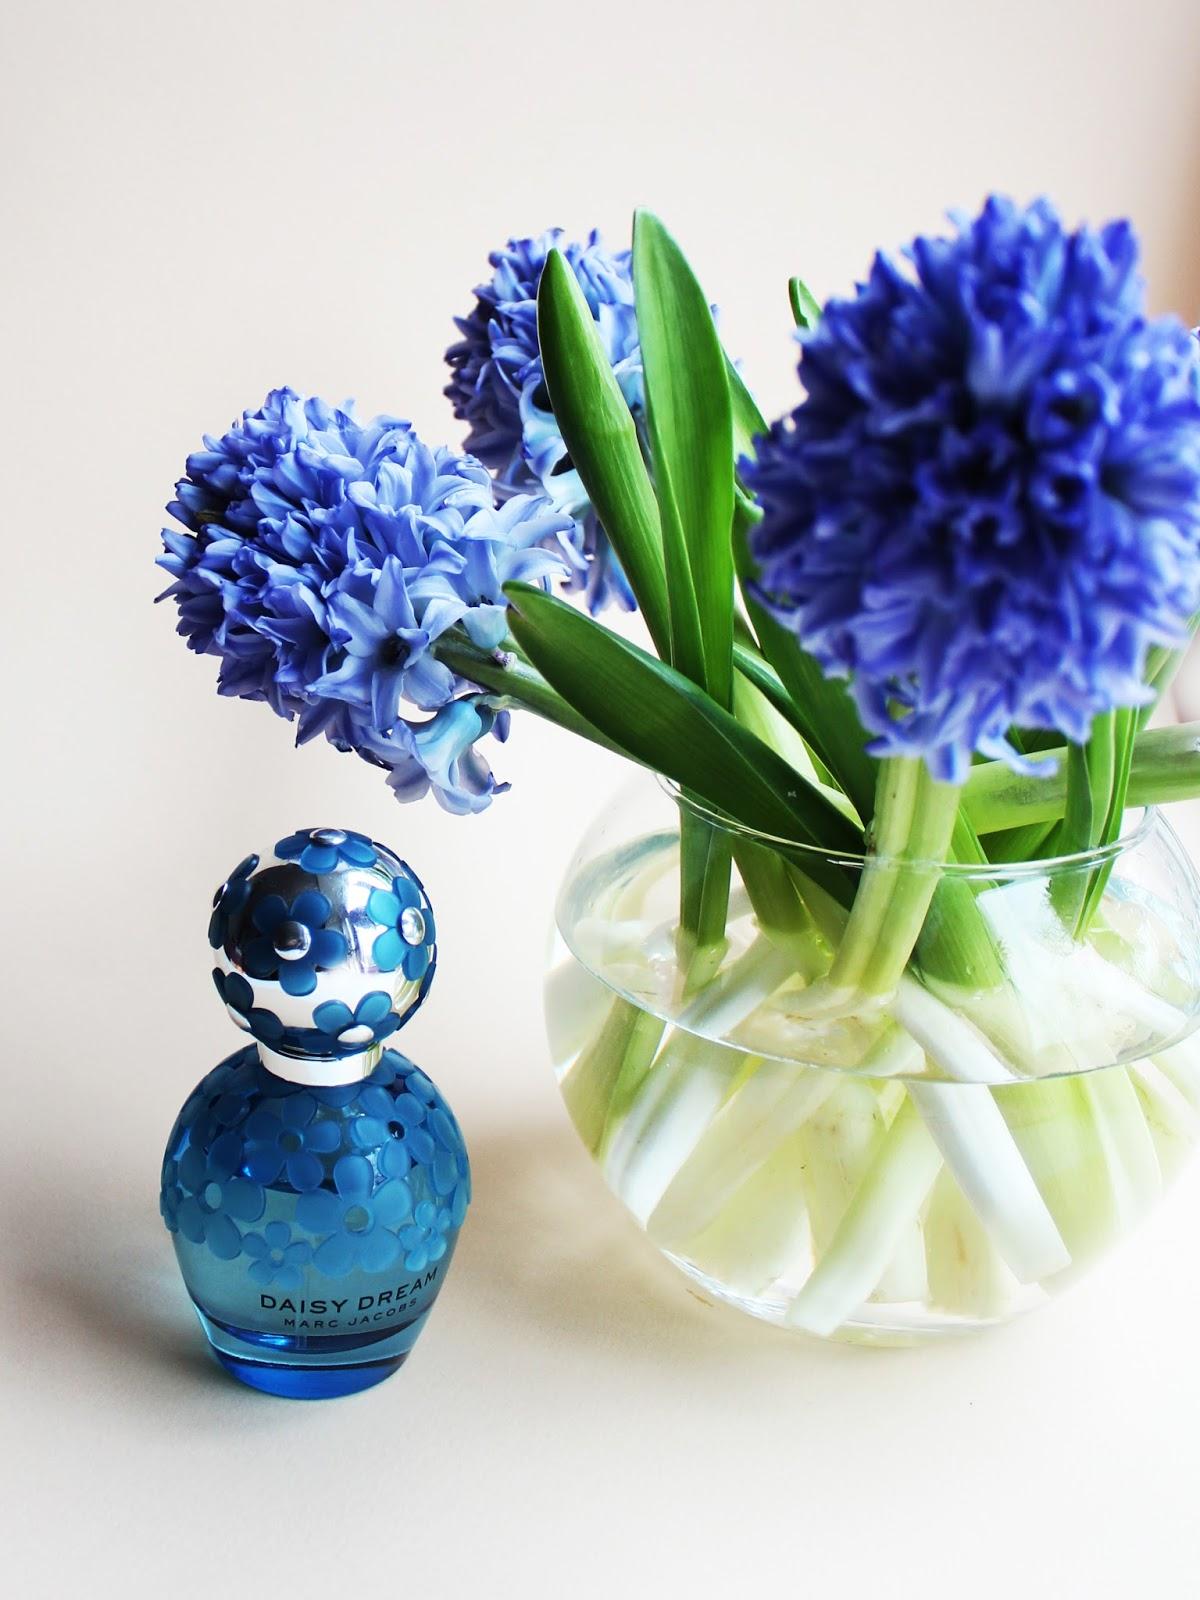 Marc Jacobs Daisy Dream Forever отзывы, парфюм купить, подарок на 8 марта, что подарить на 8 марта